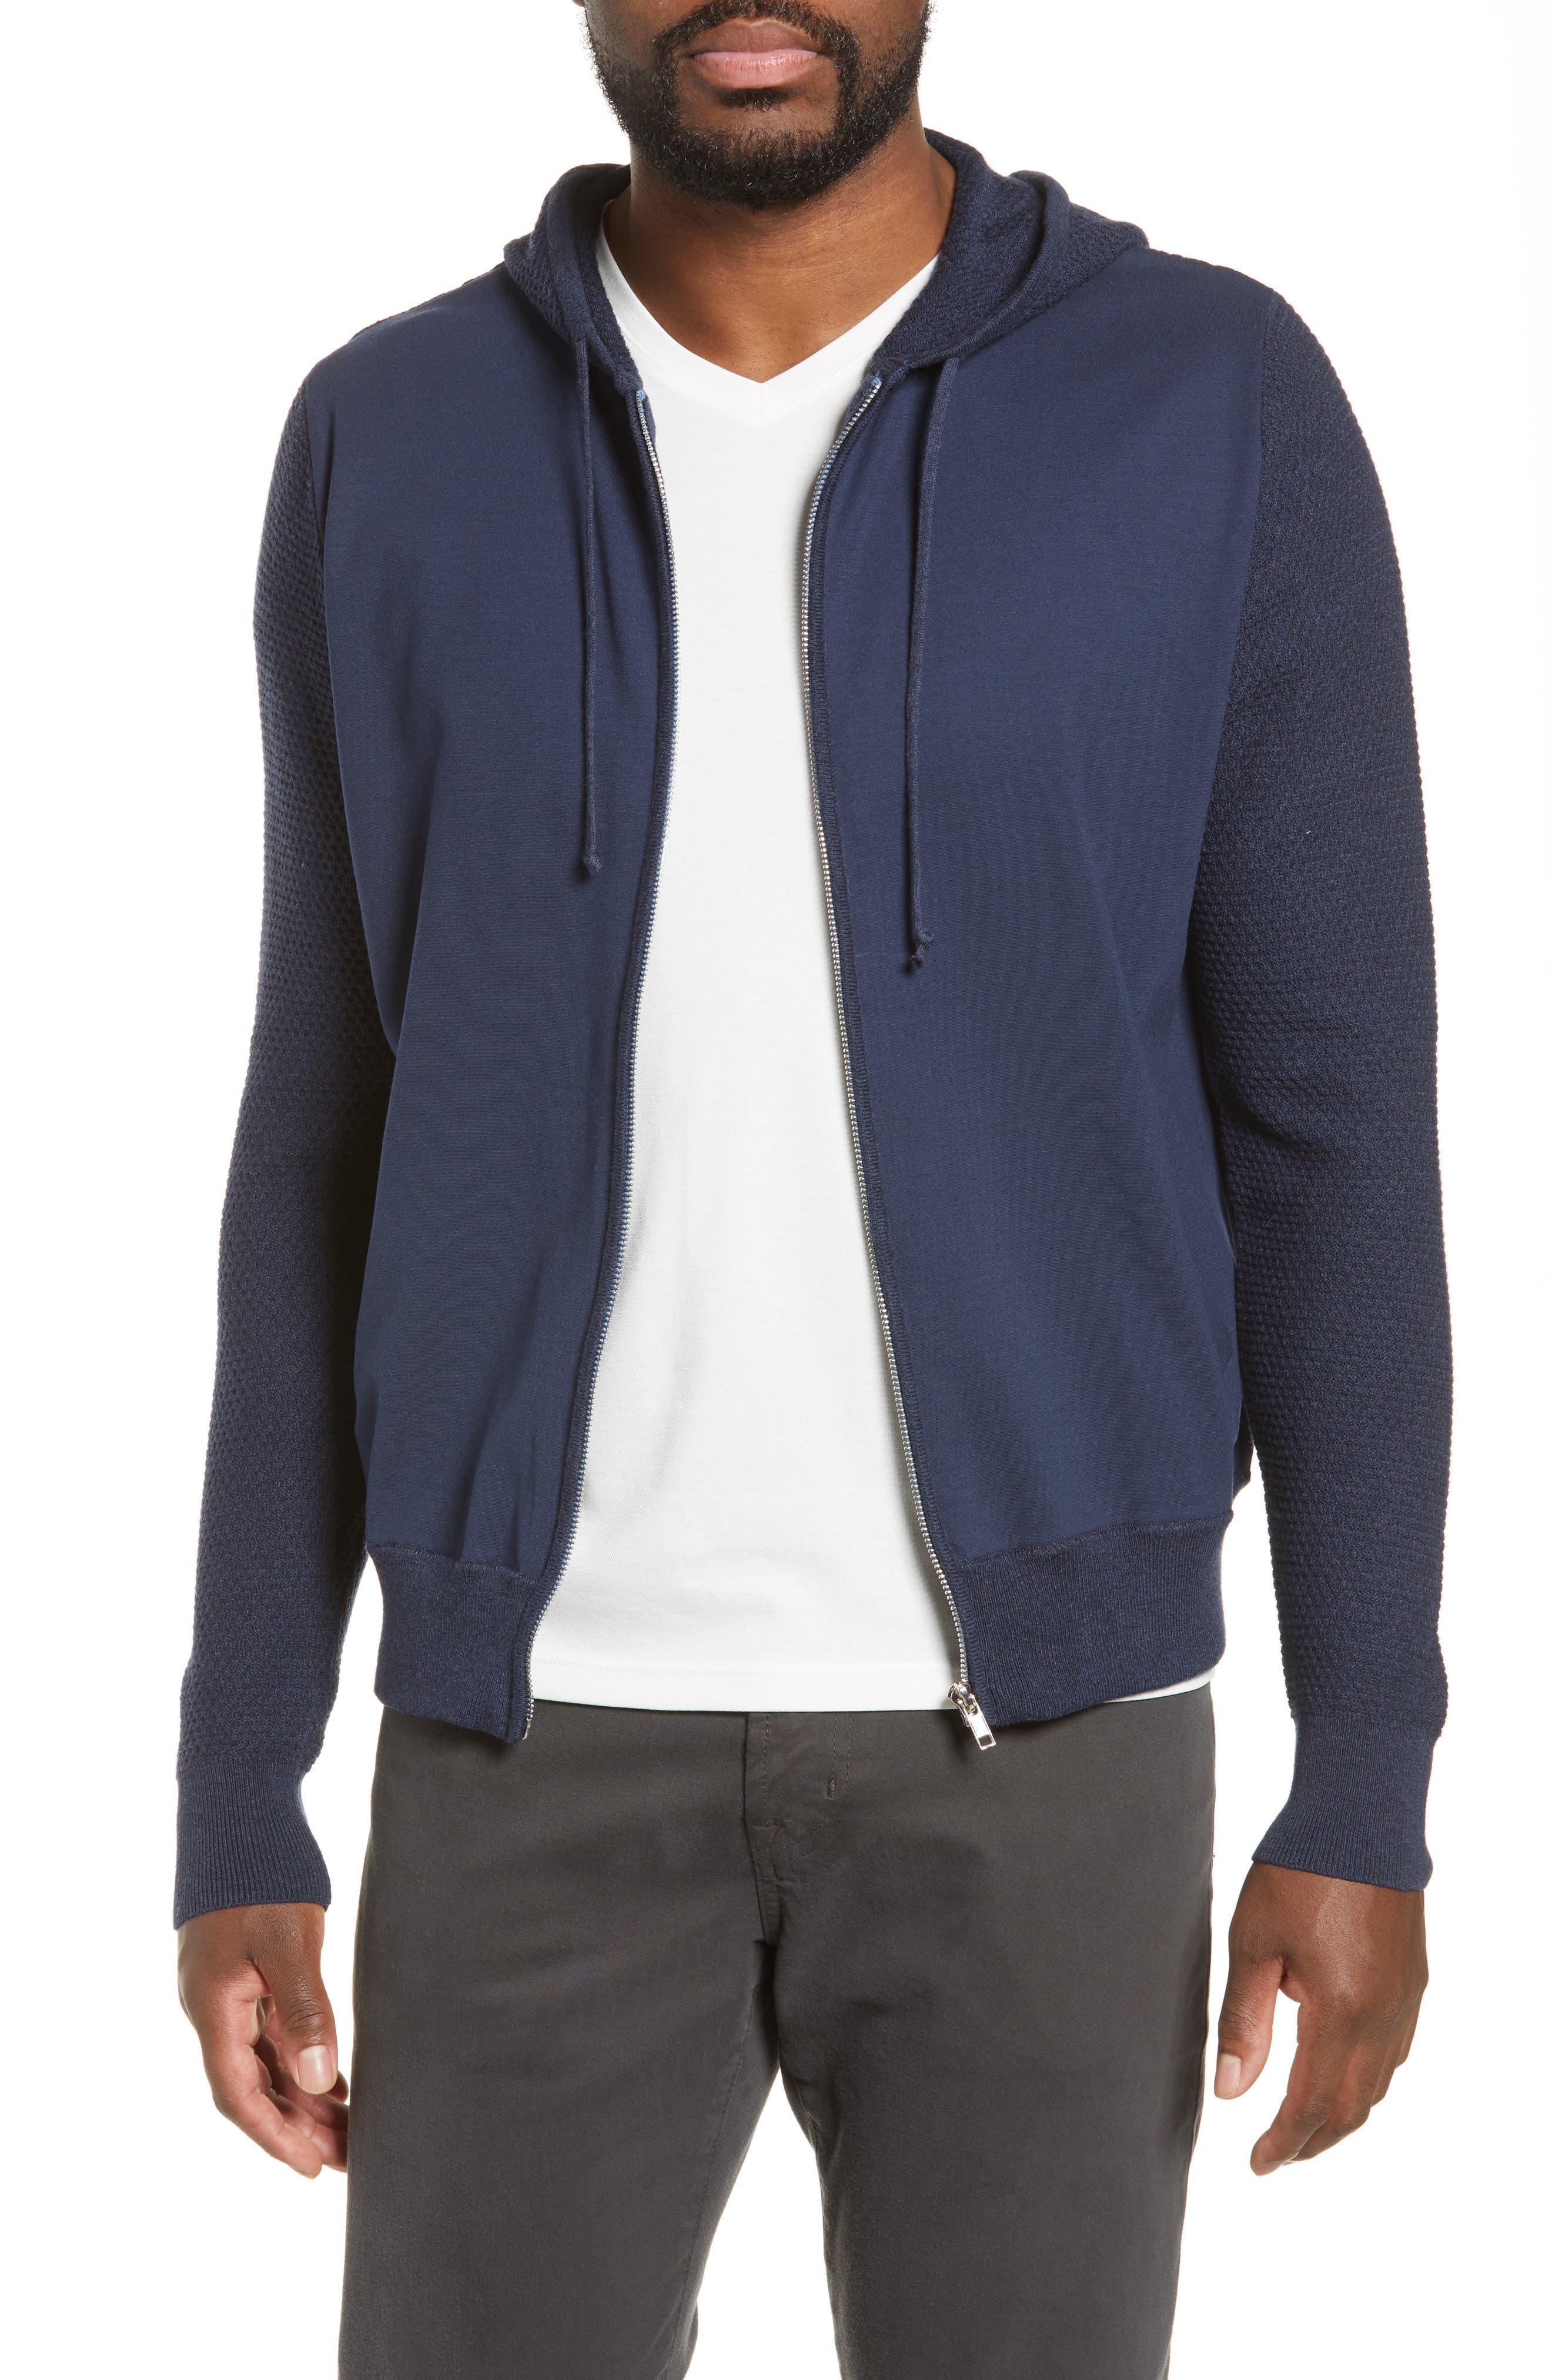 ZACHARY PRELL, Cedarhurst Hooded Zip Sweater, Main thumbnail 1, color, NAVY